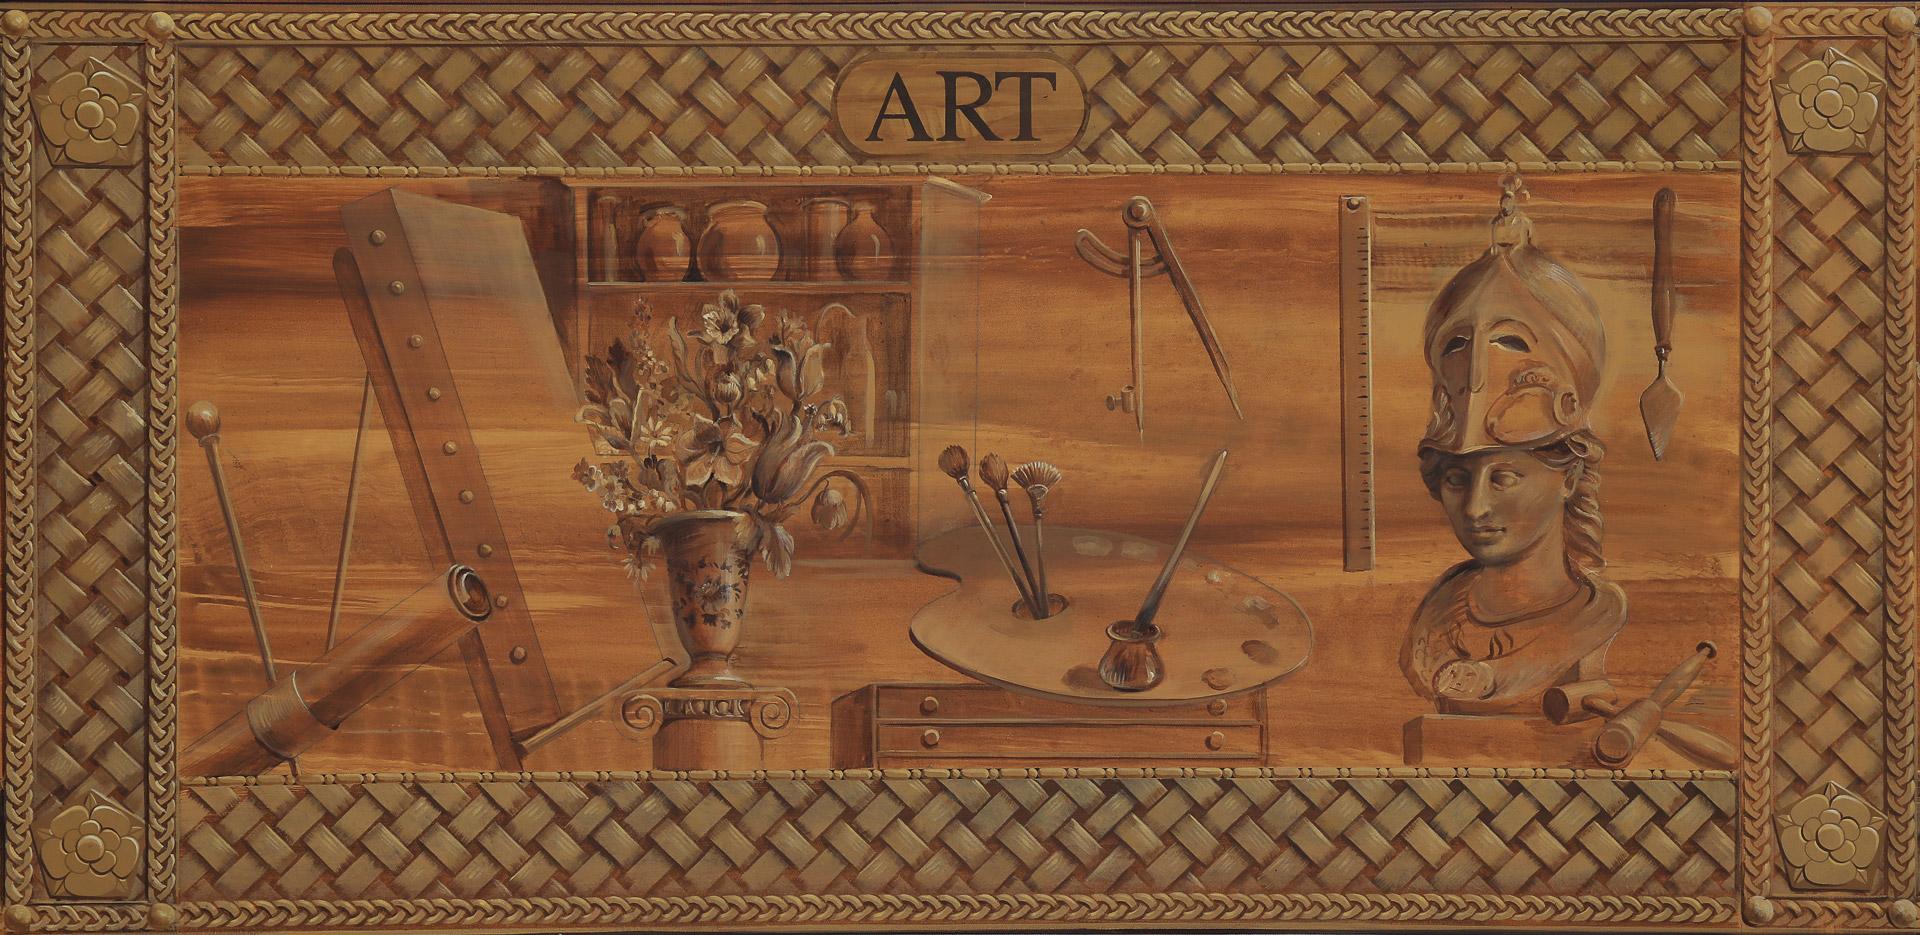 Mural detail of faux wood frieze of art supplies